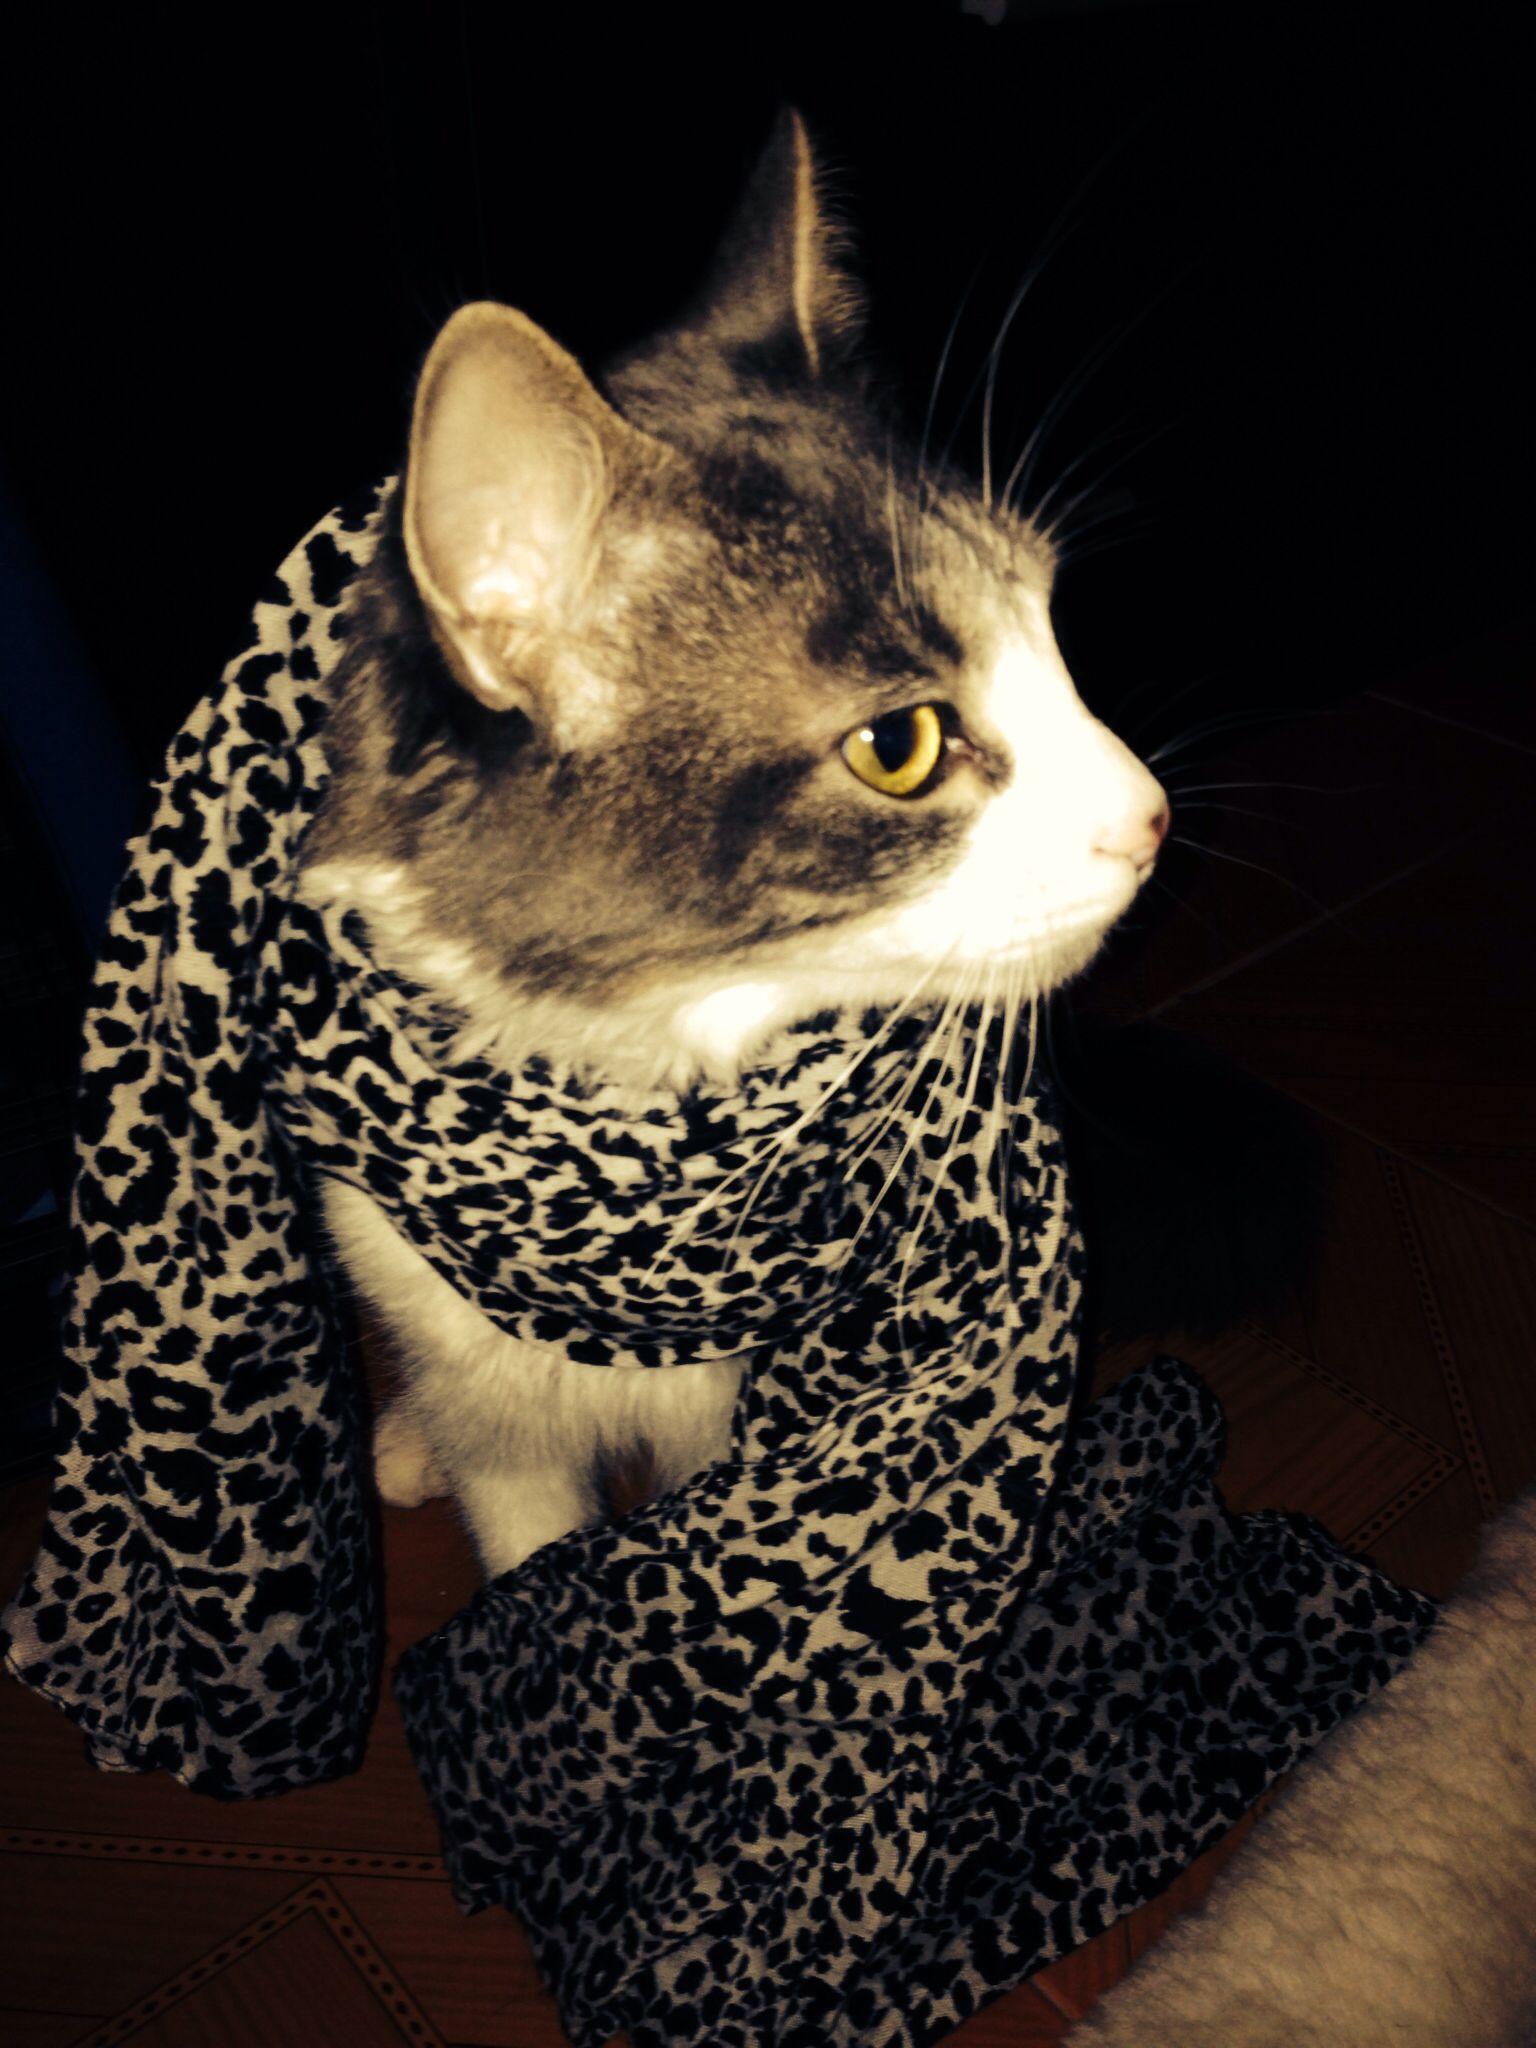 Fashionista' cat